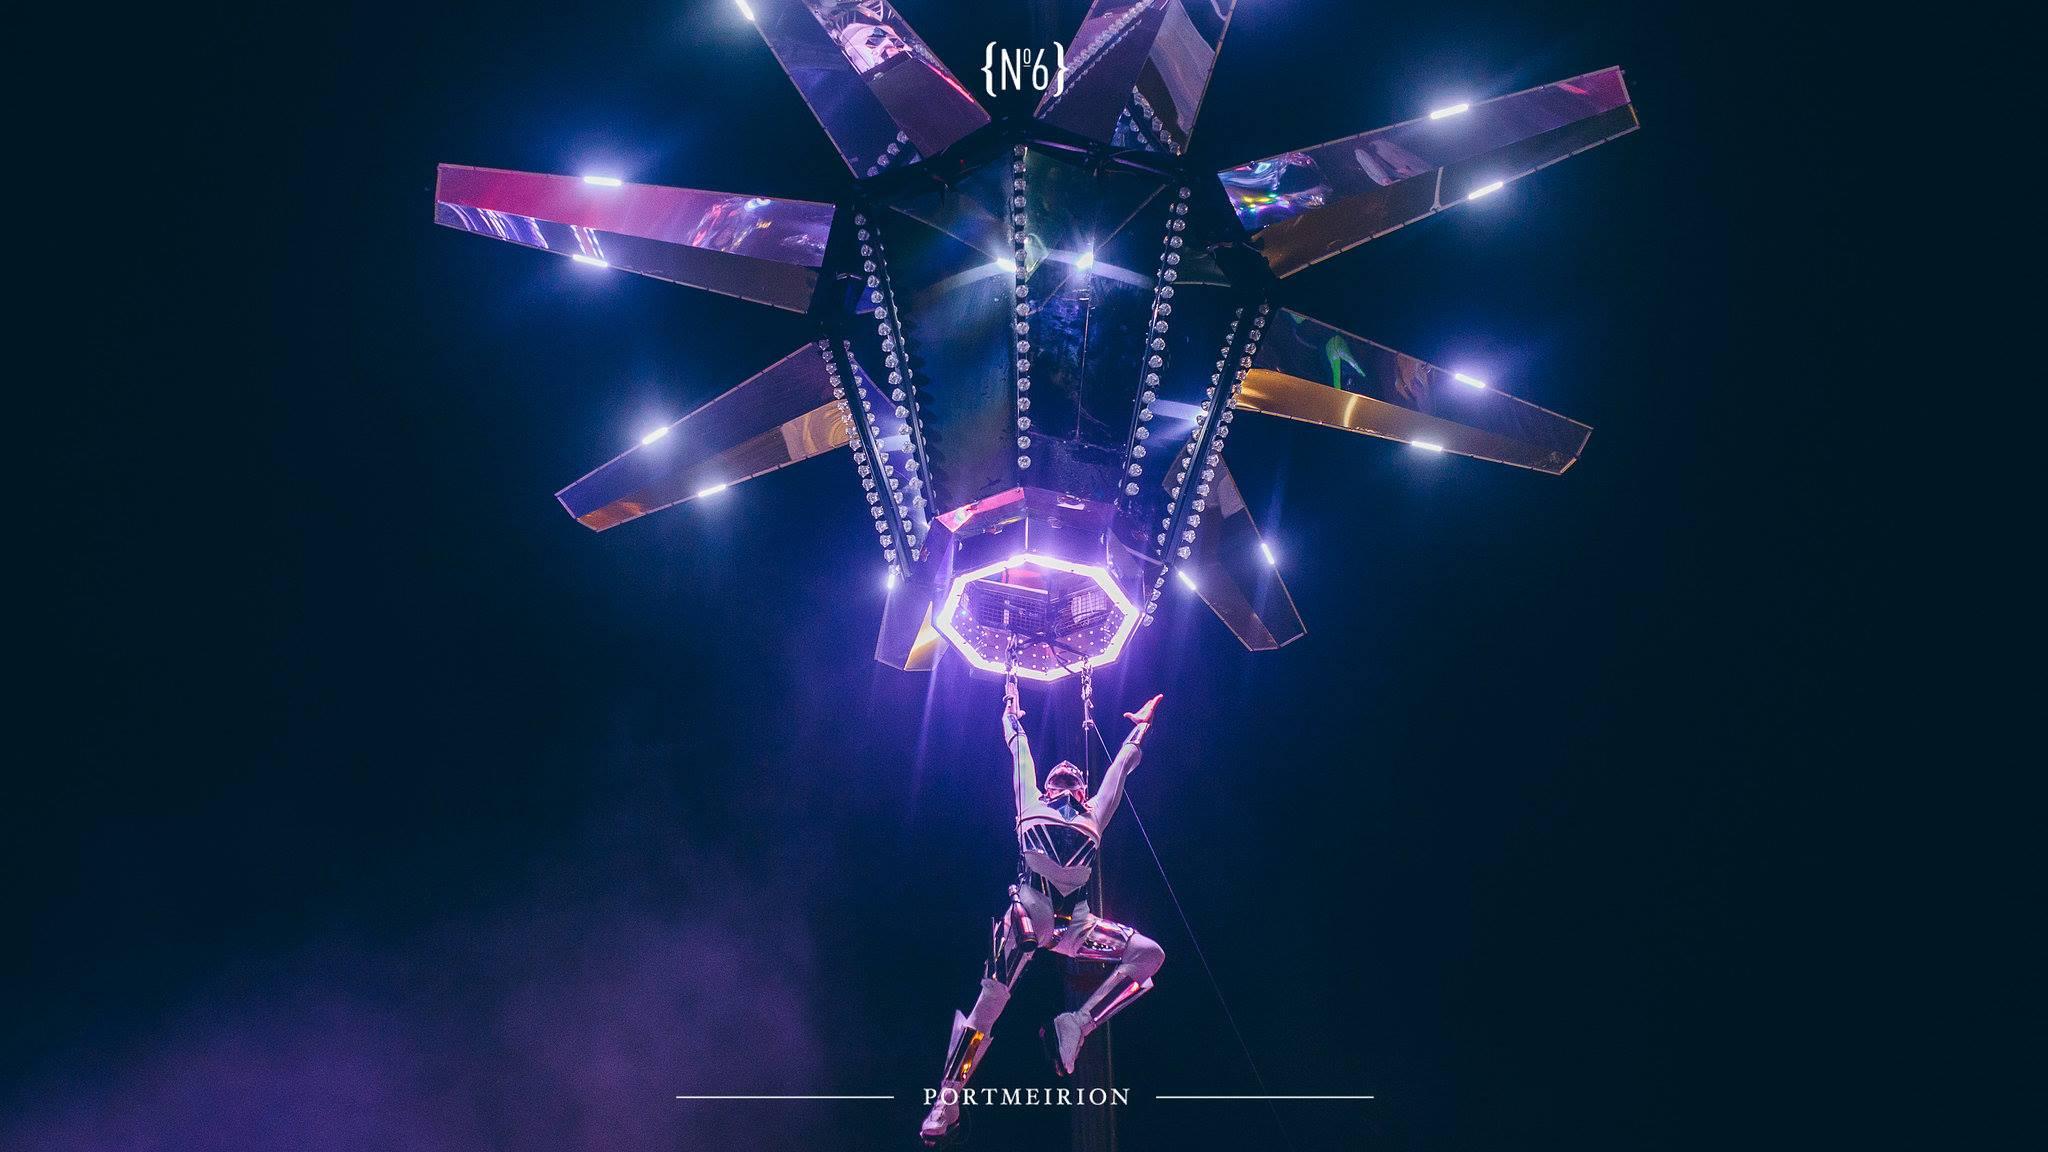 festival no. 6.jpg